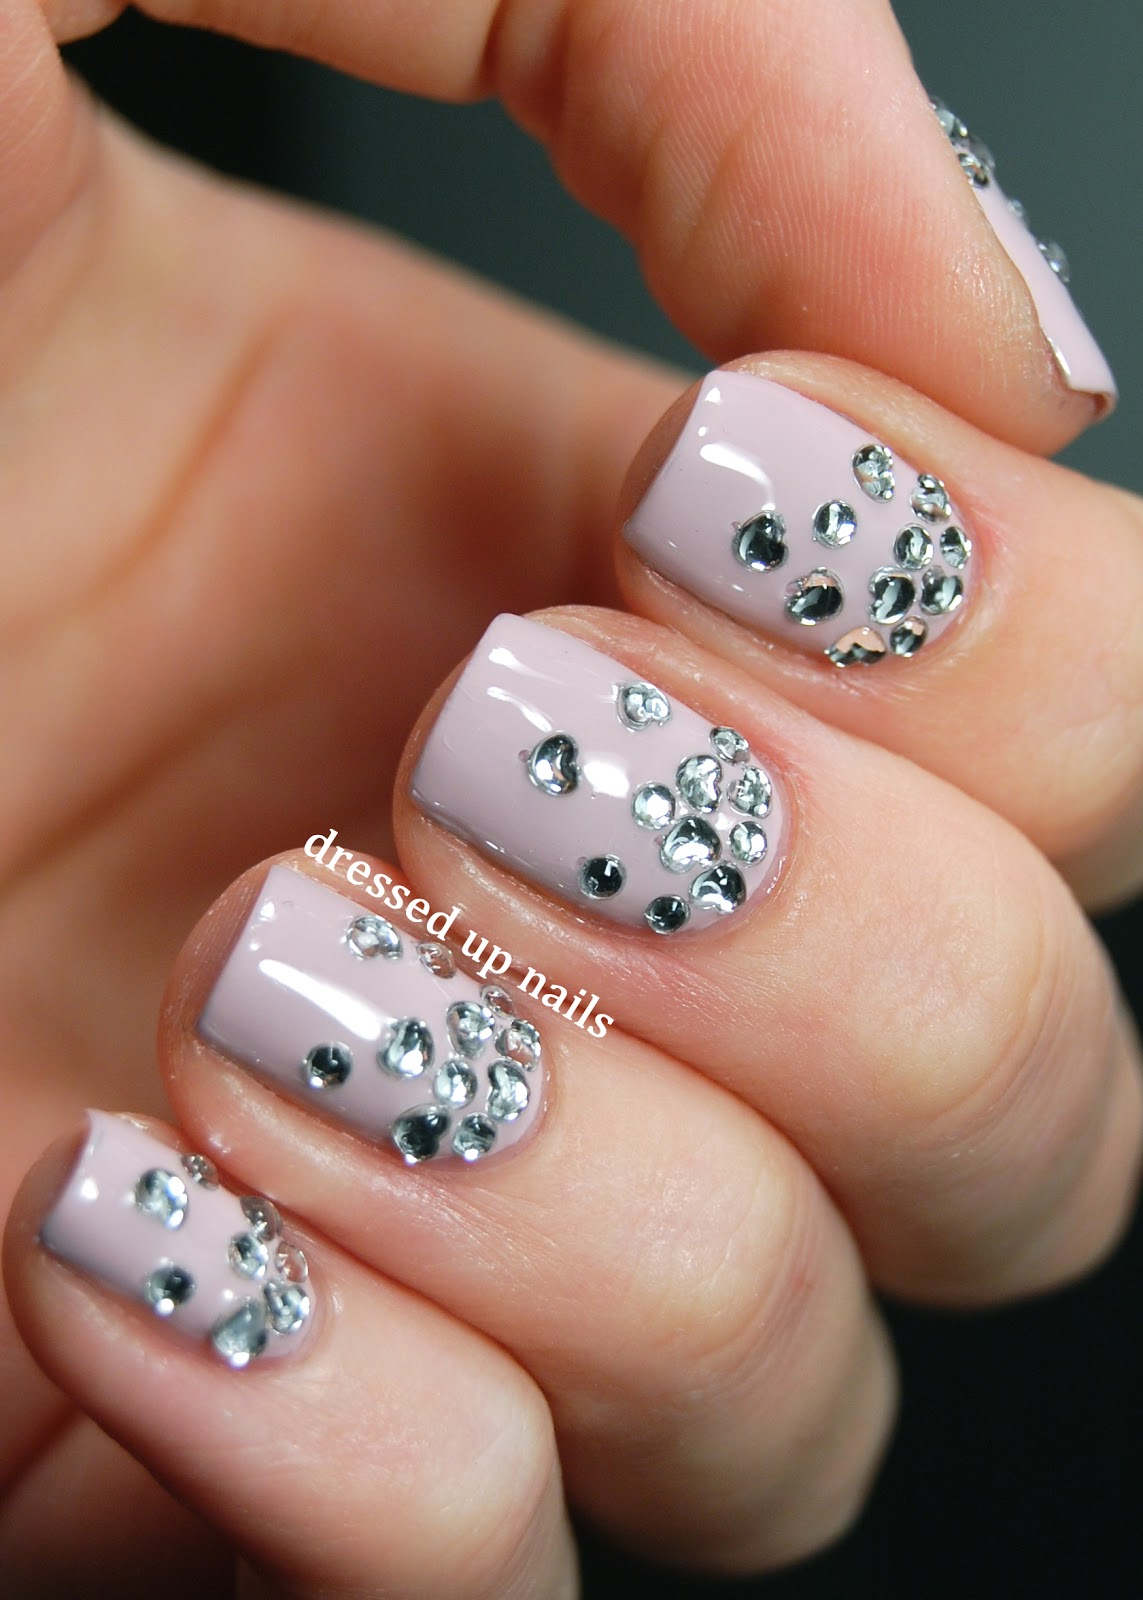 Nail Art Design 2014: Nail art rhinestones